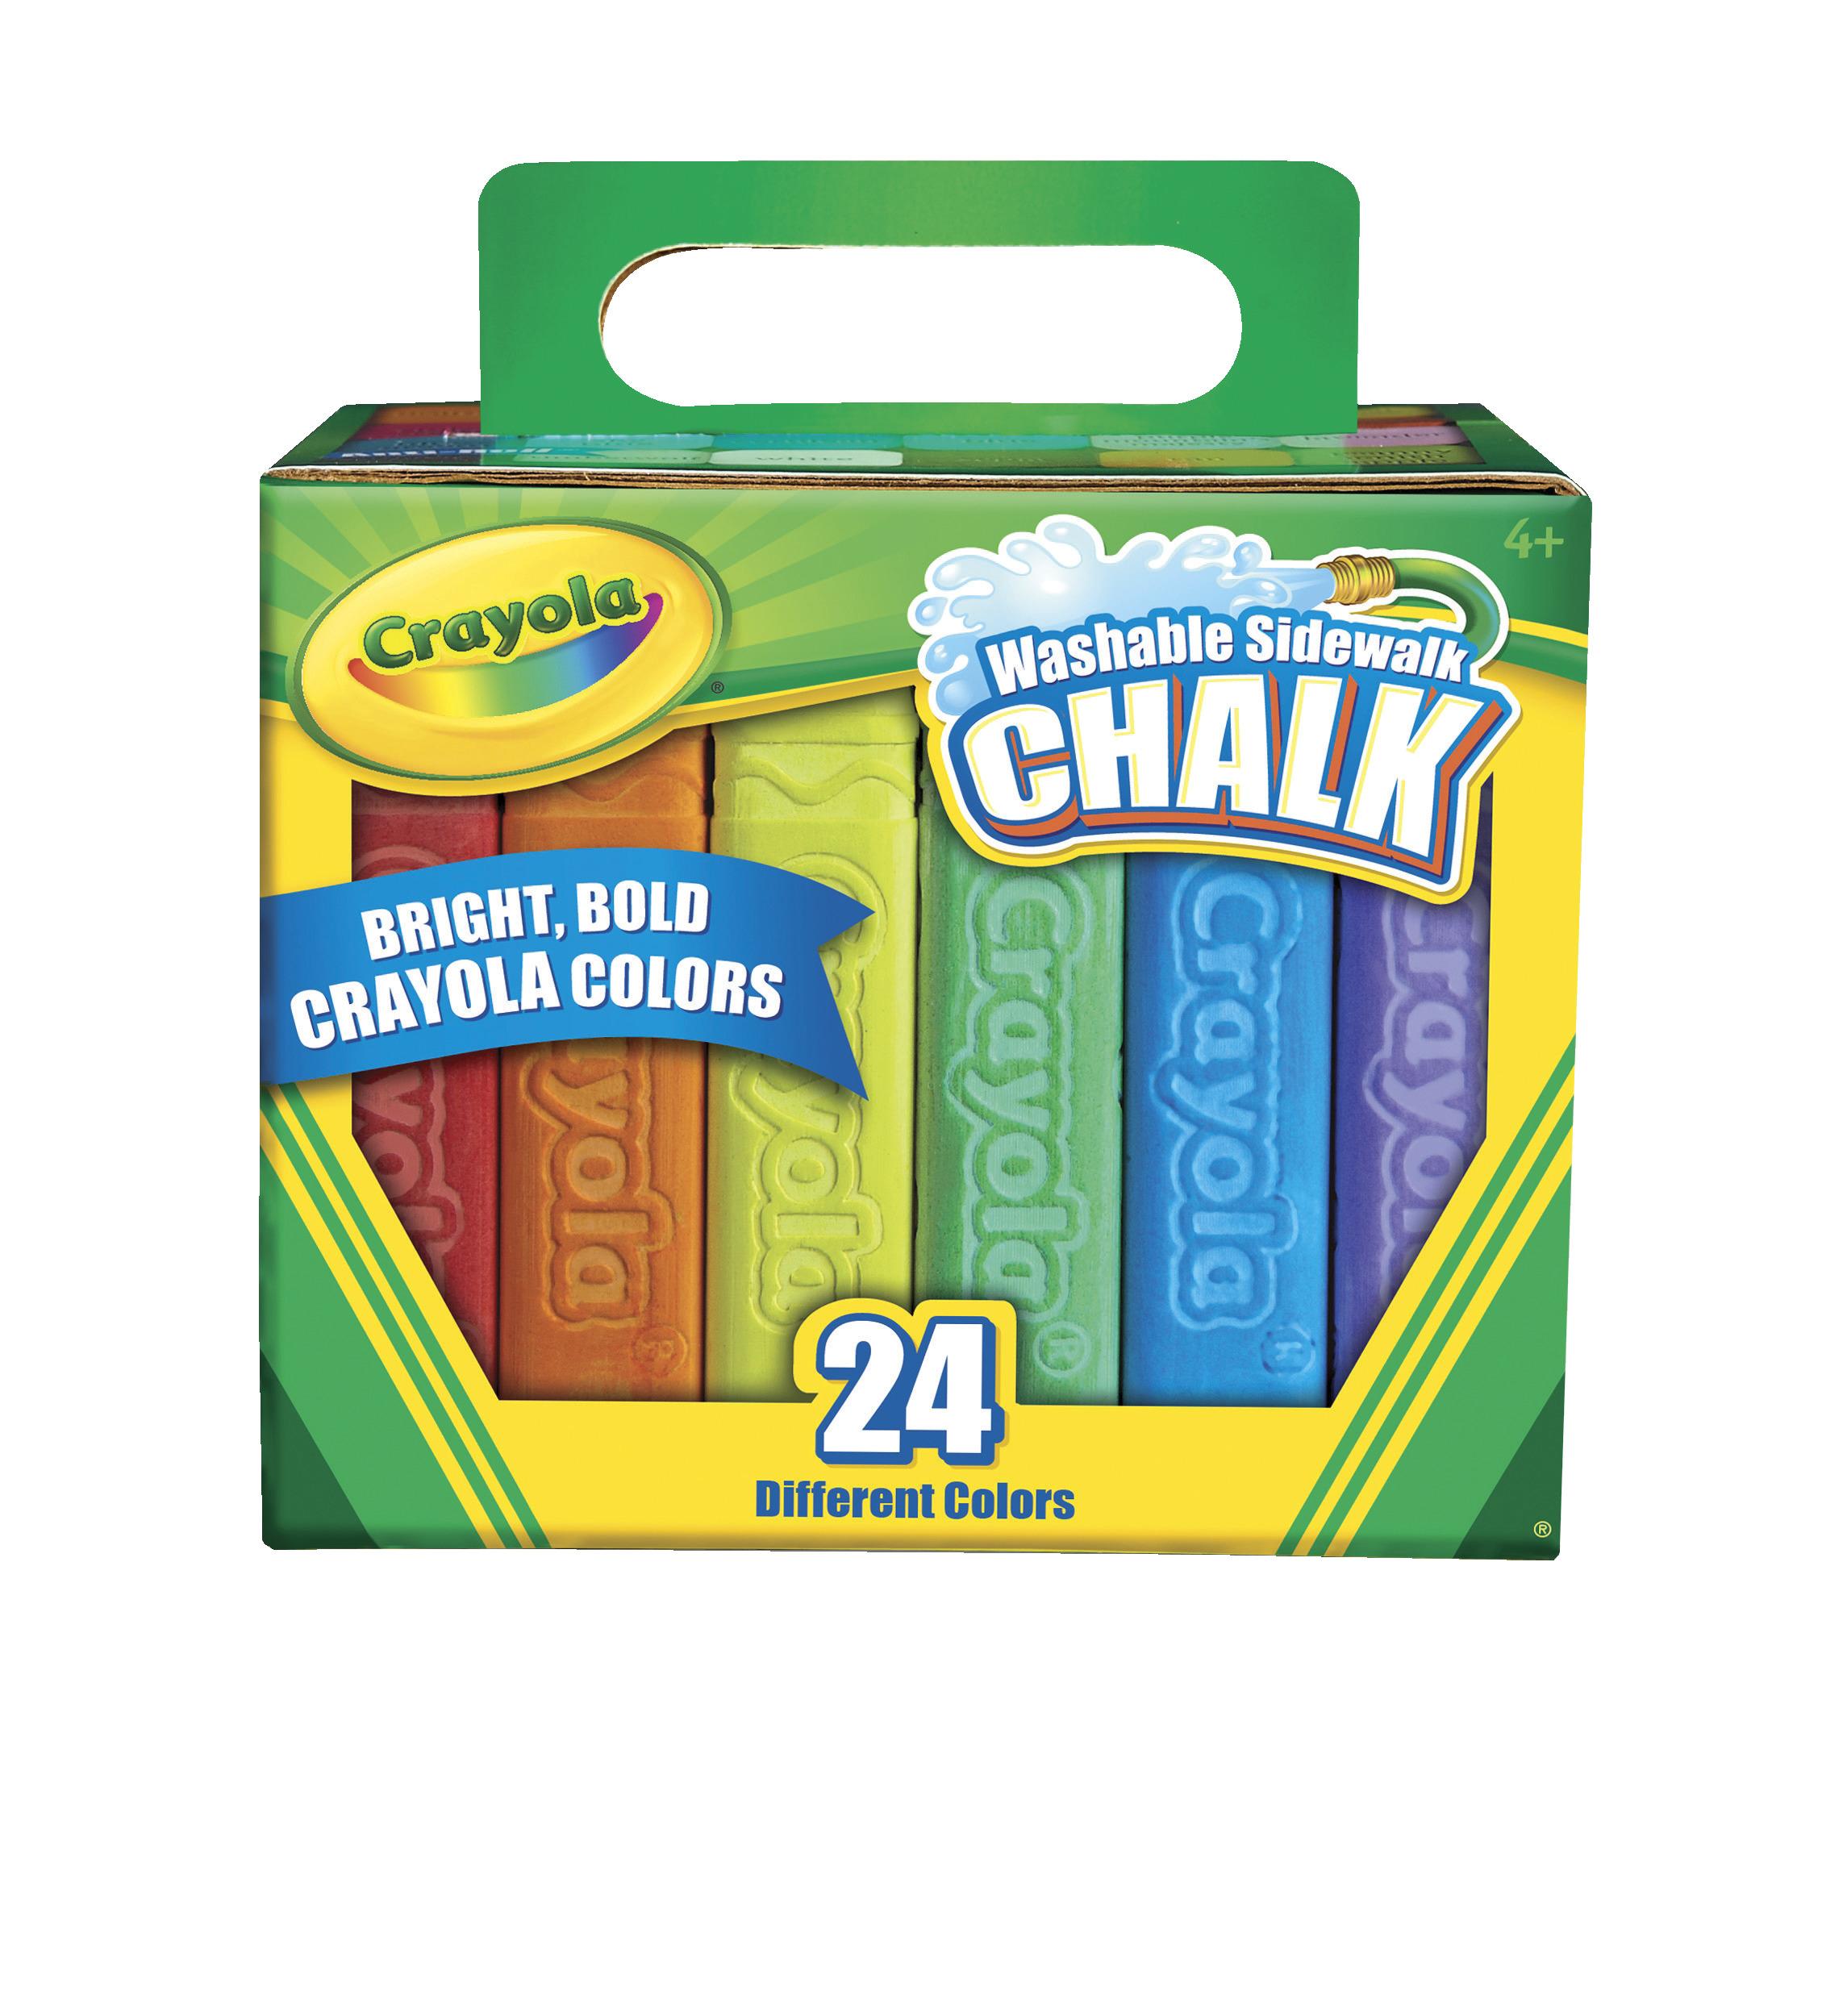 Crayola 24 Count Washable Non-Toxic Anti-Roll Sidewalk Chalk in ...